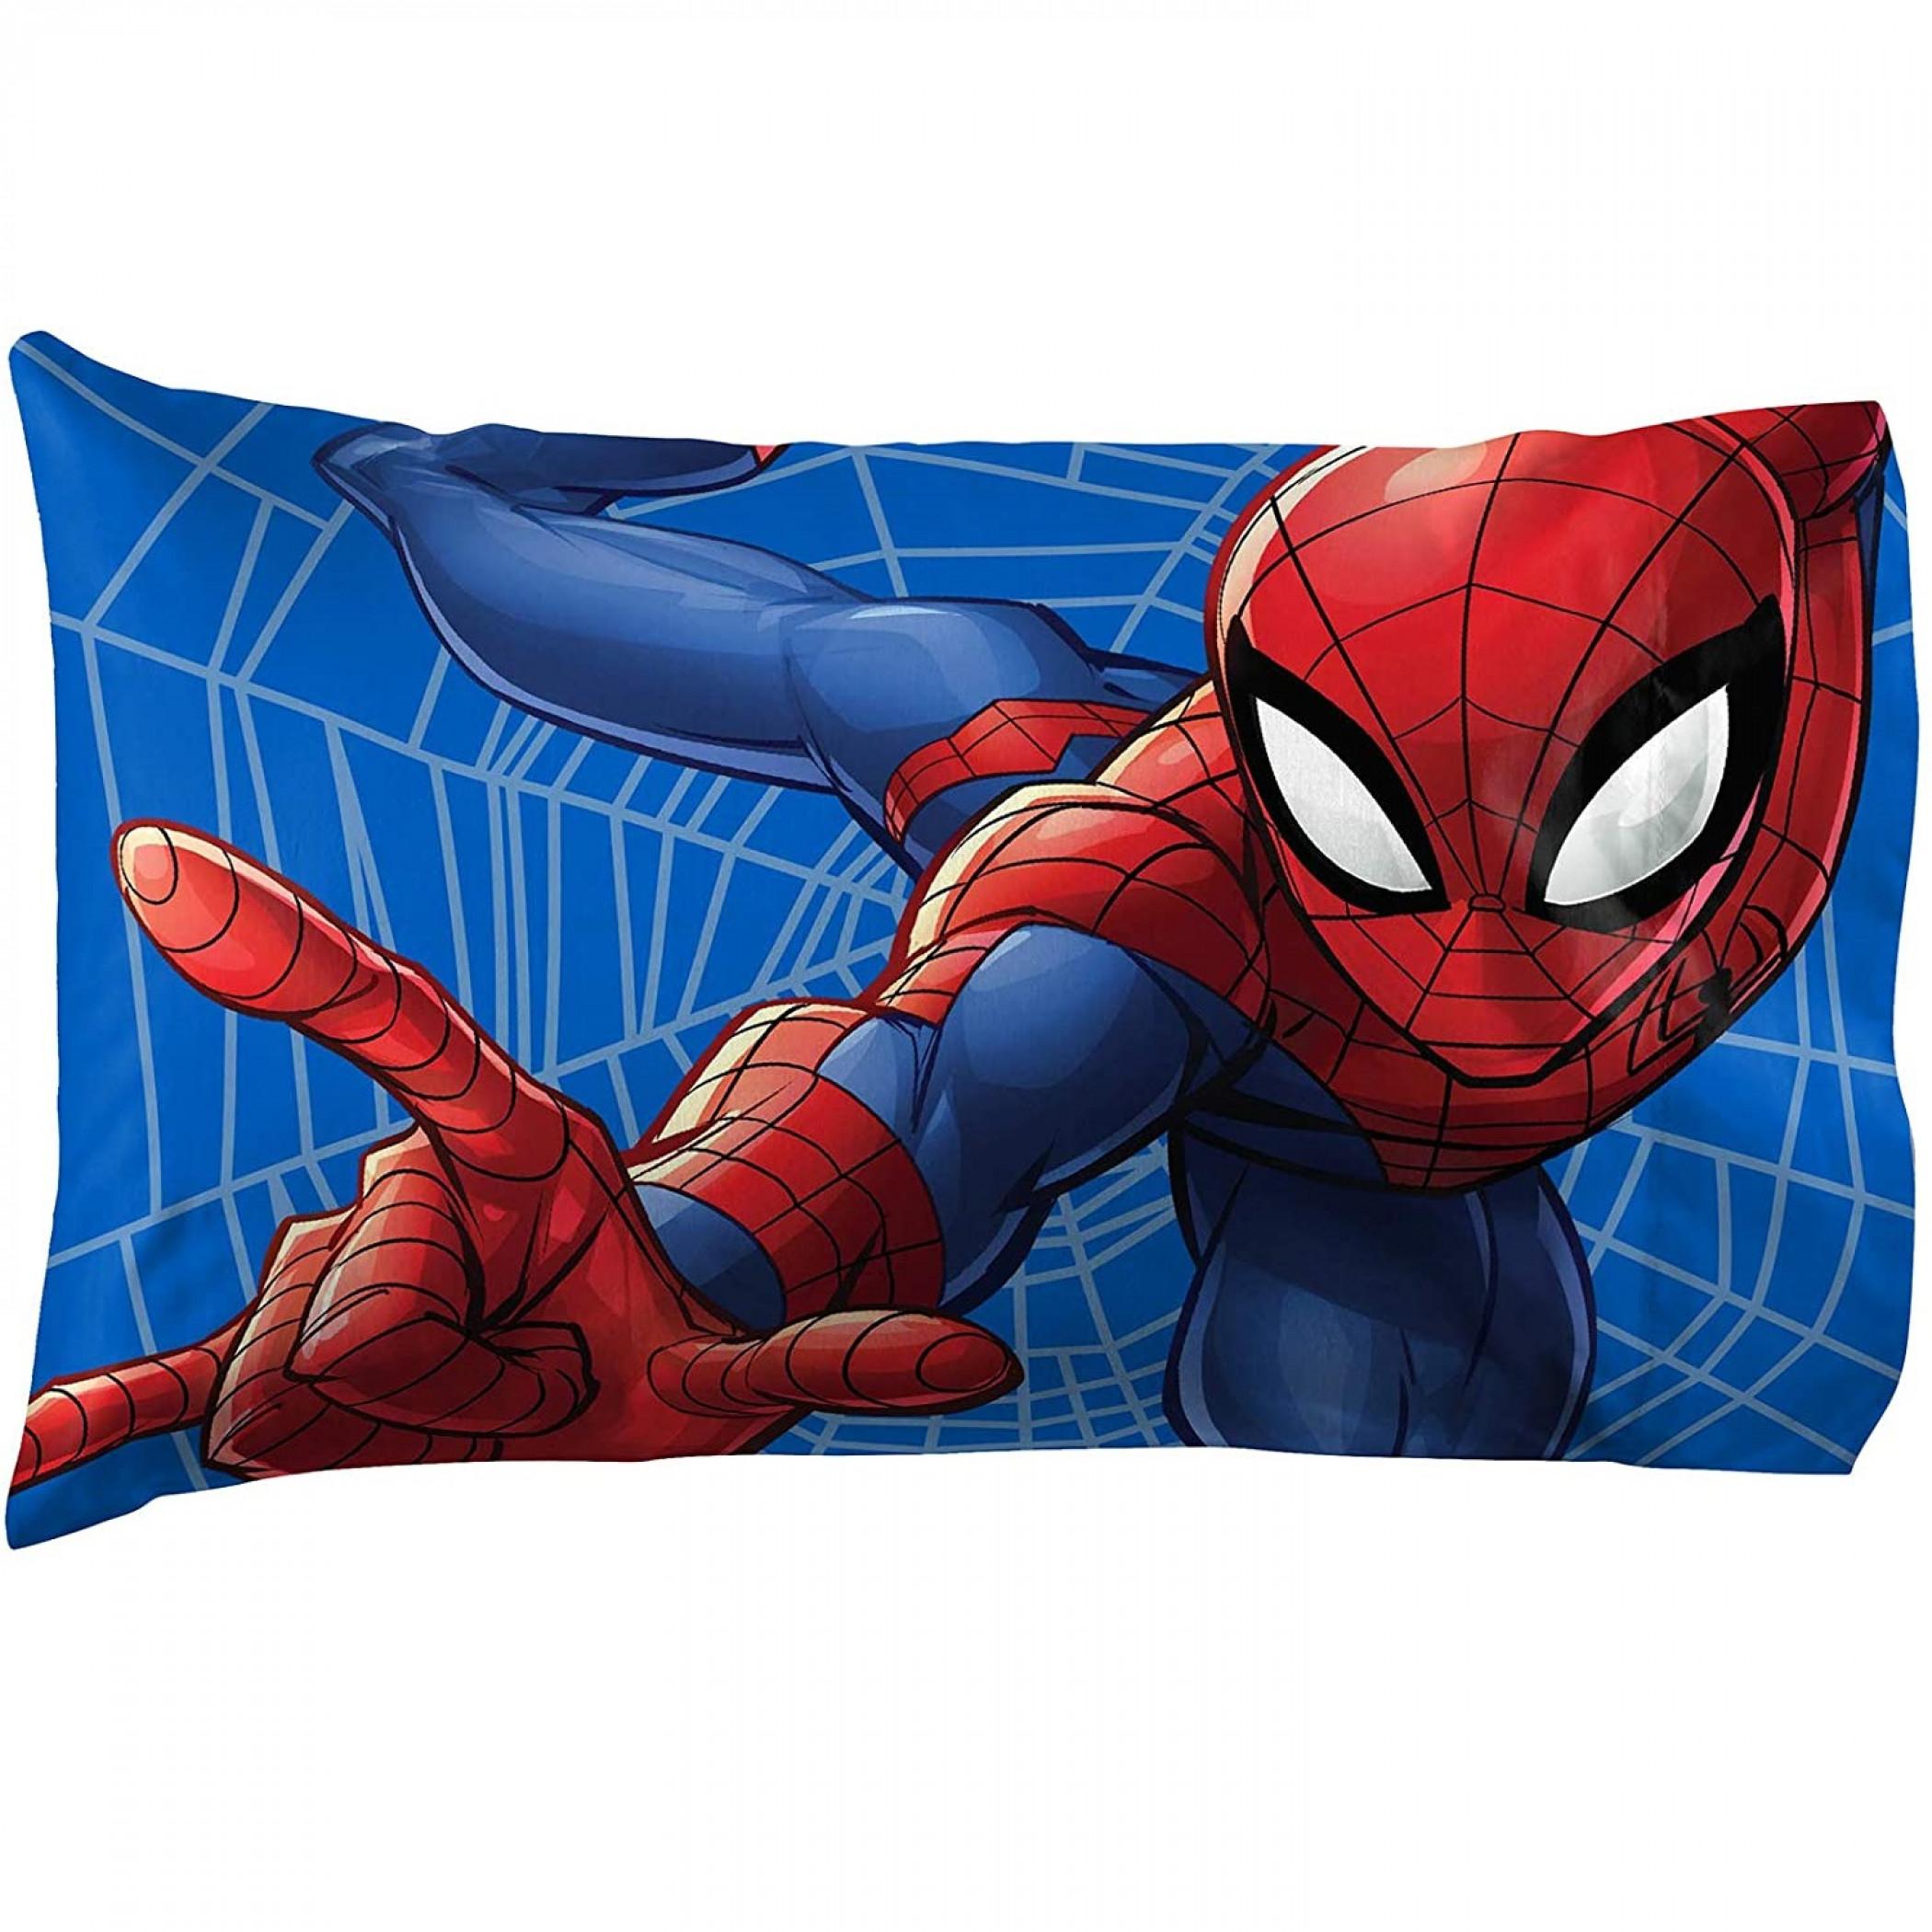 Spider-Man Web Sides Pillow Case